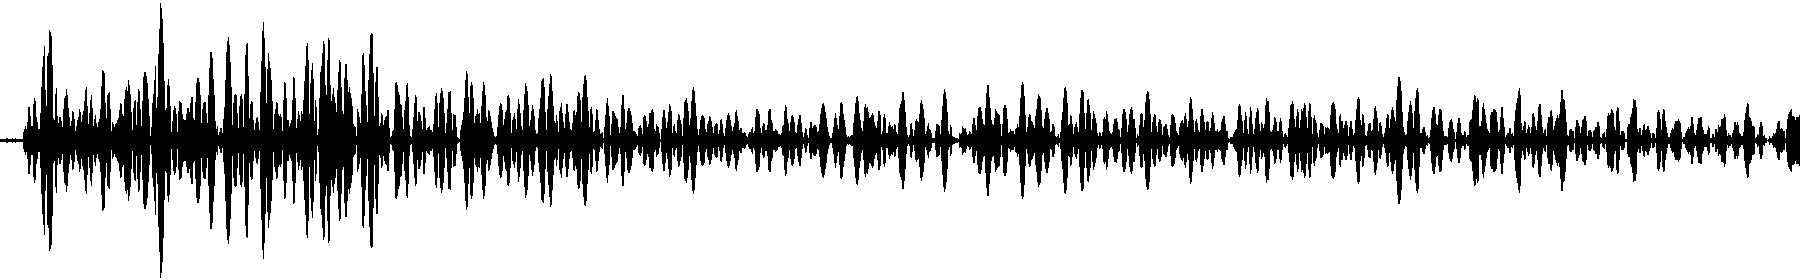 perc2